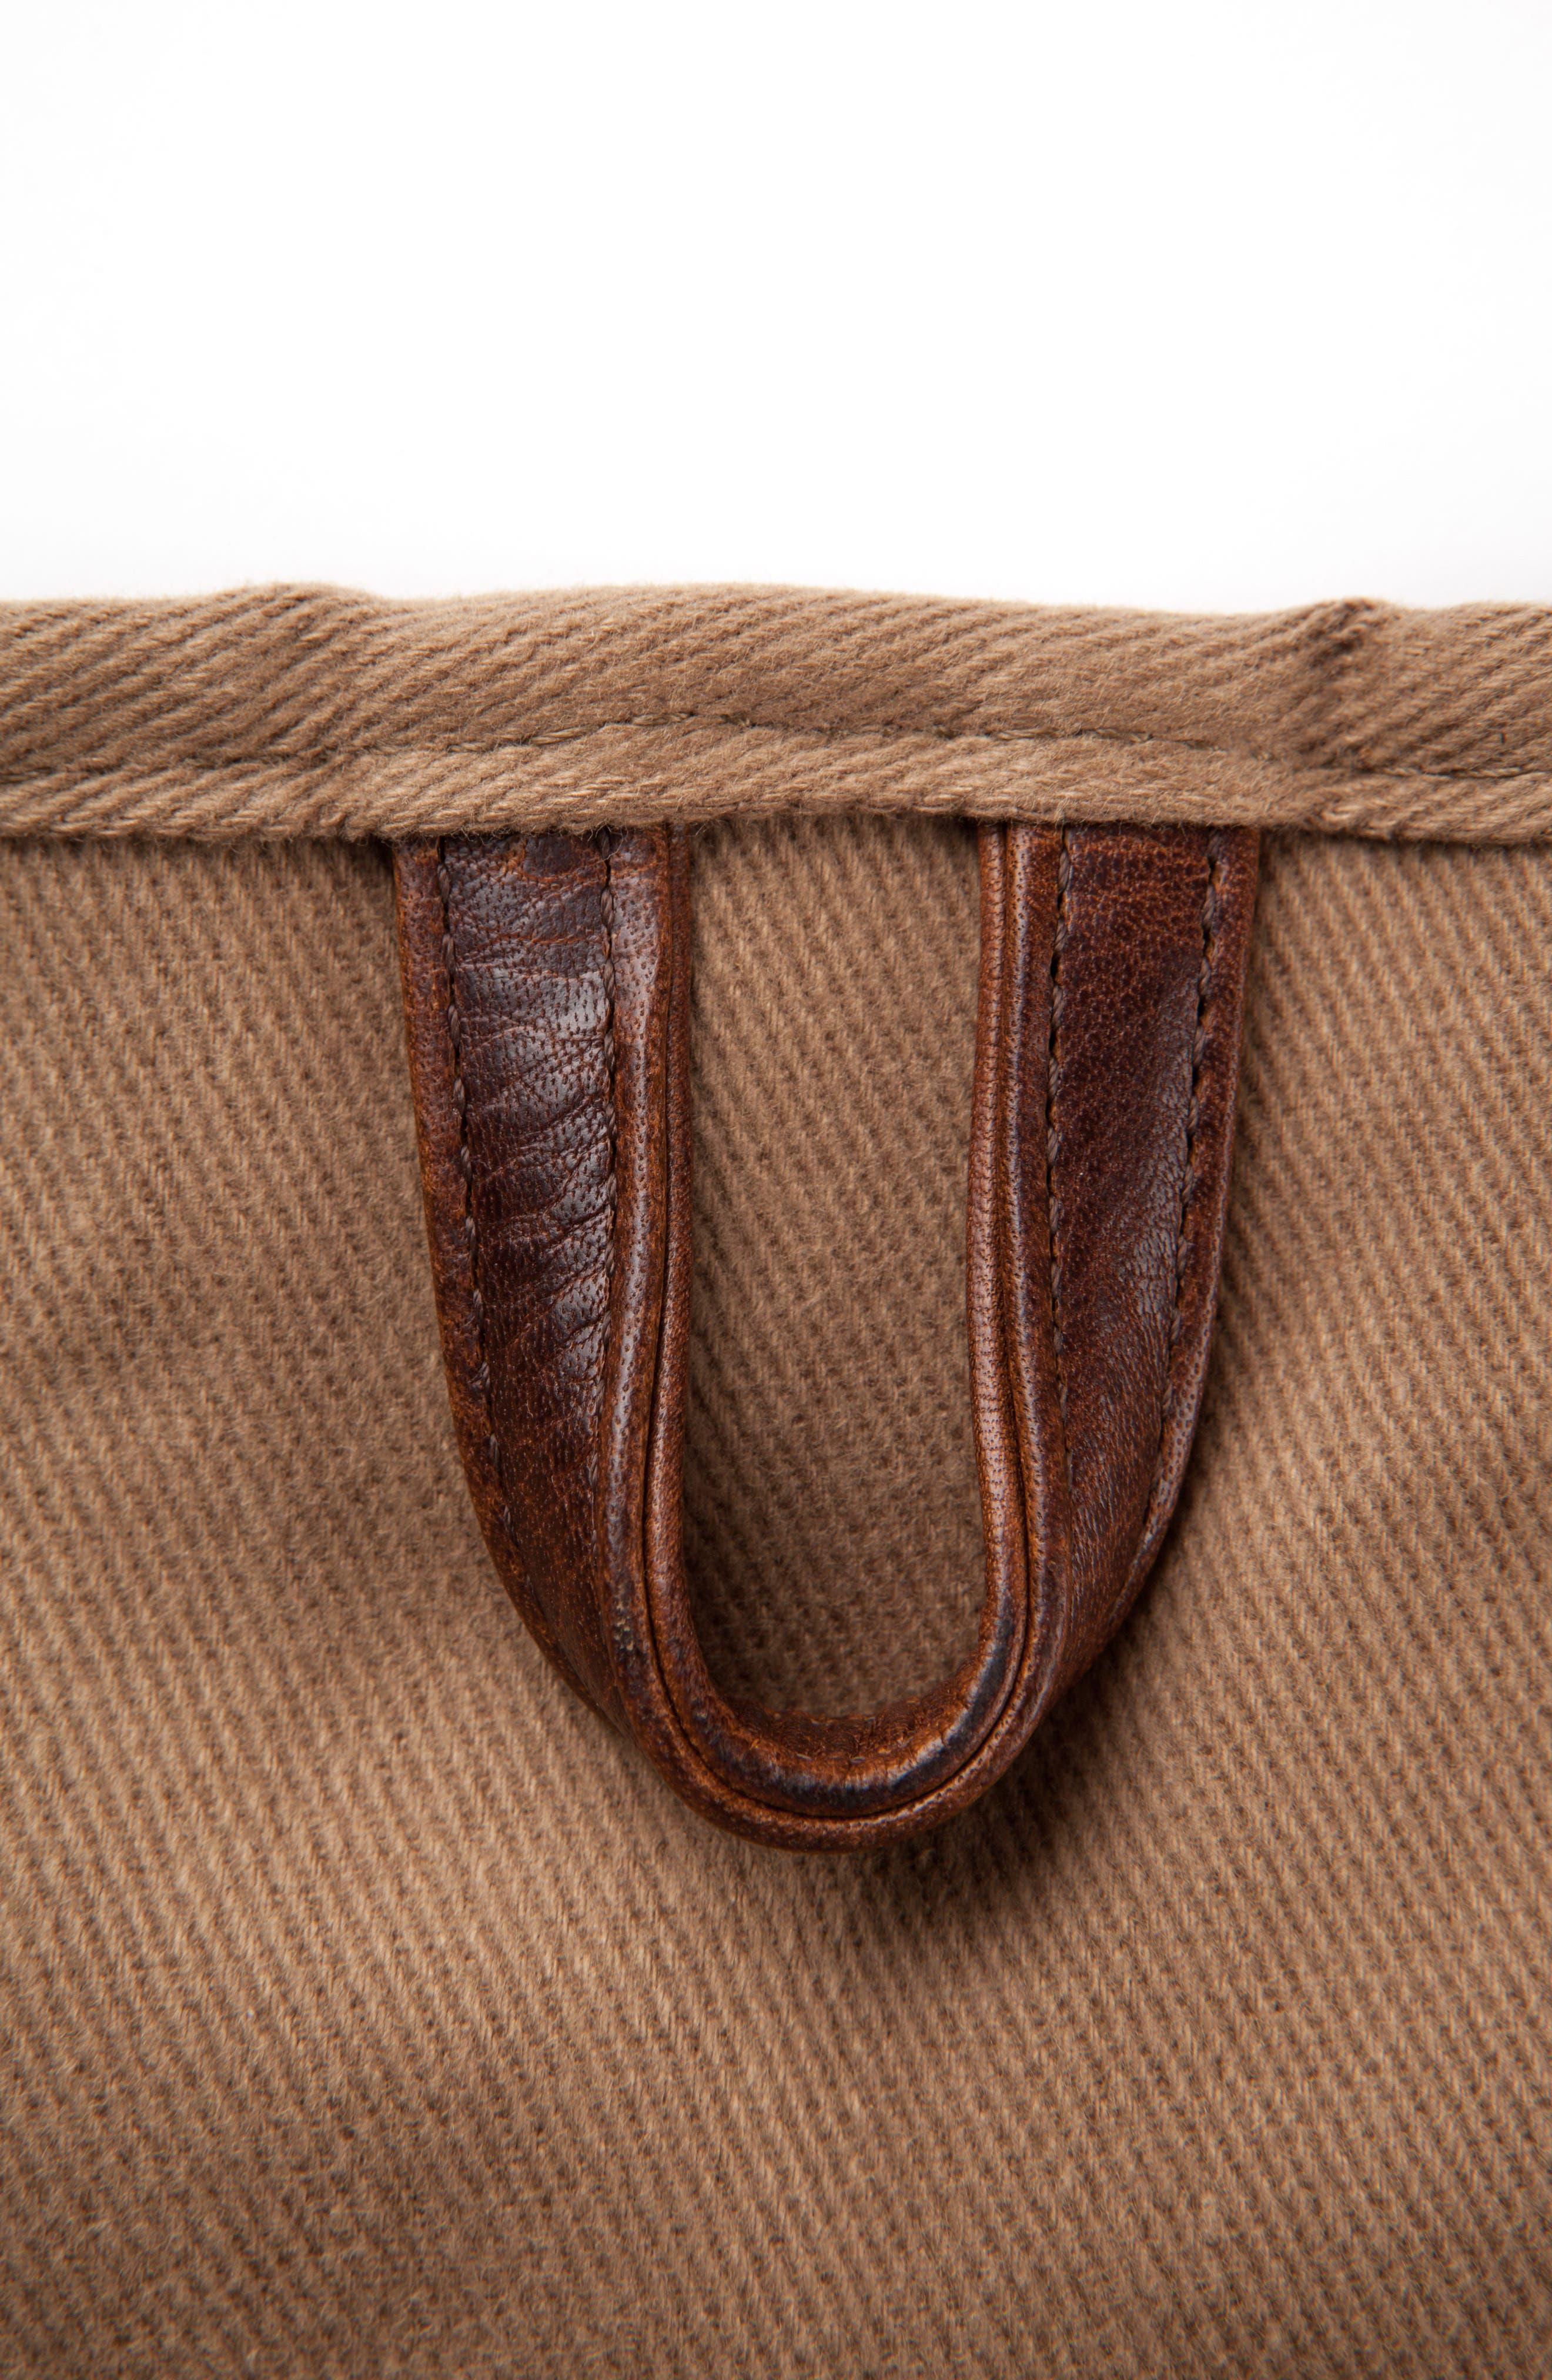 Holton Garment Bag,                             Alternate thumbnail 4, color,                             Brushed Tan Twill